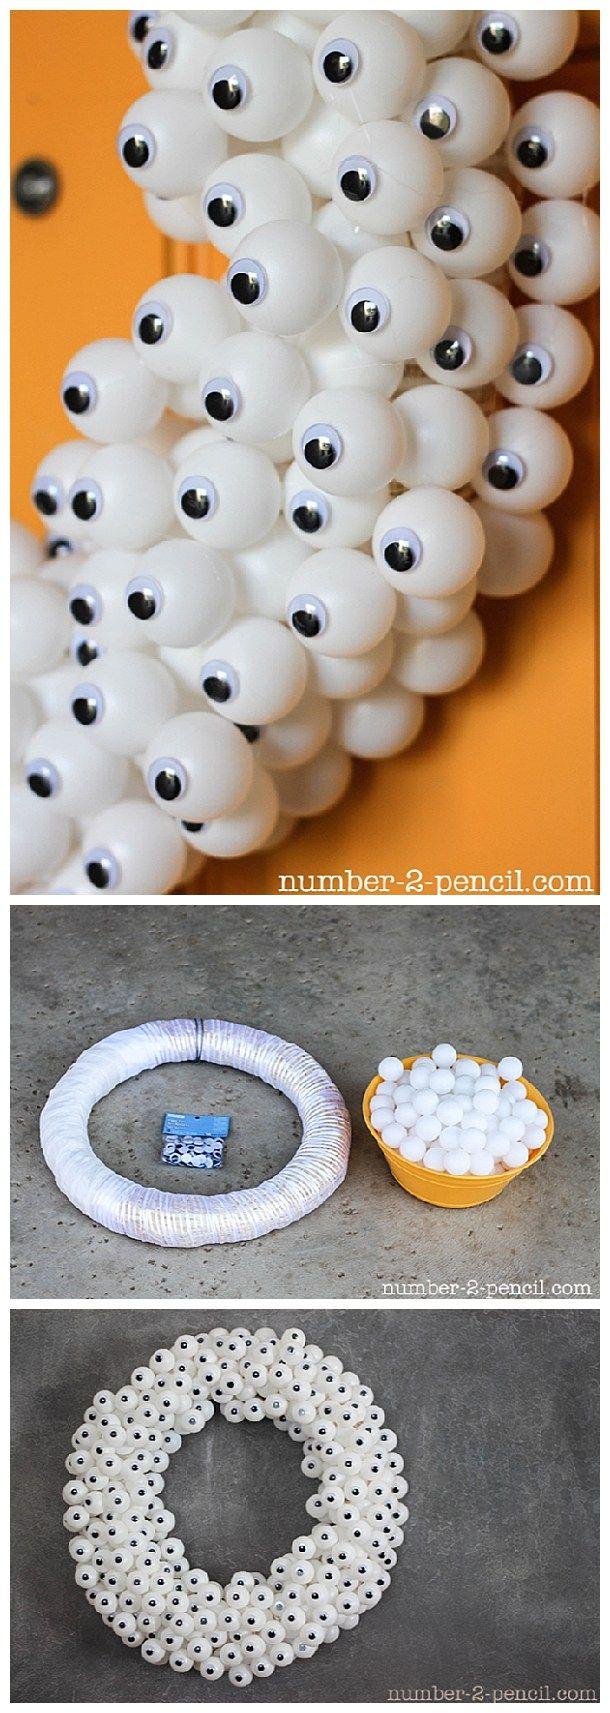 diy googly eyes ping pong ball halloween wreath tutorial no 2 pencil spooktacular - Halloween Ping Pong Balls